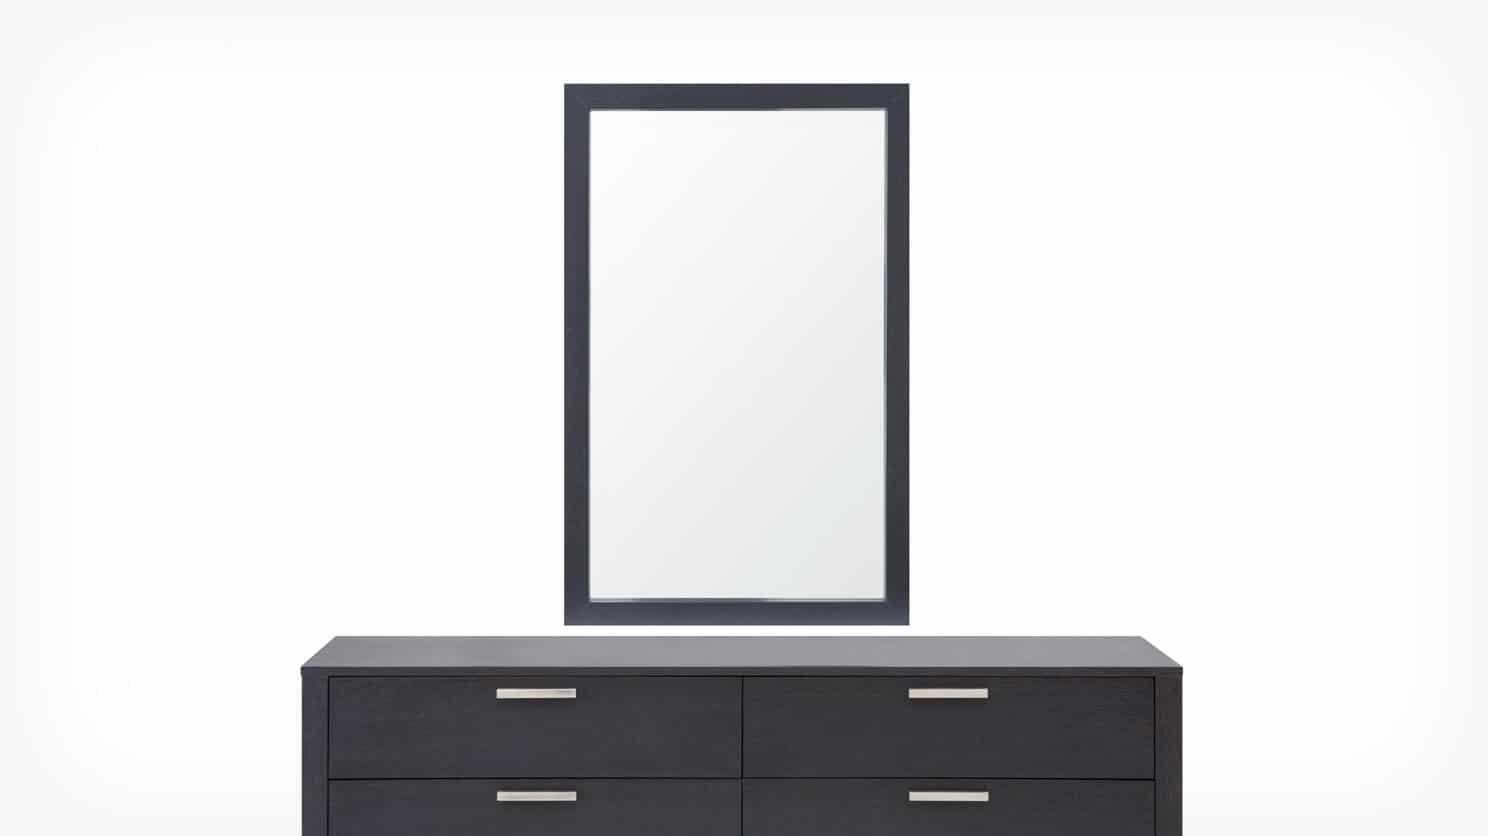 6020 401 12 2 mirror core dresser onyx front